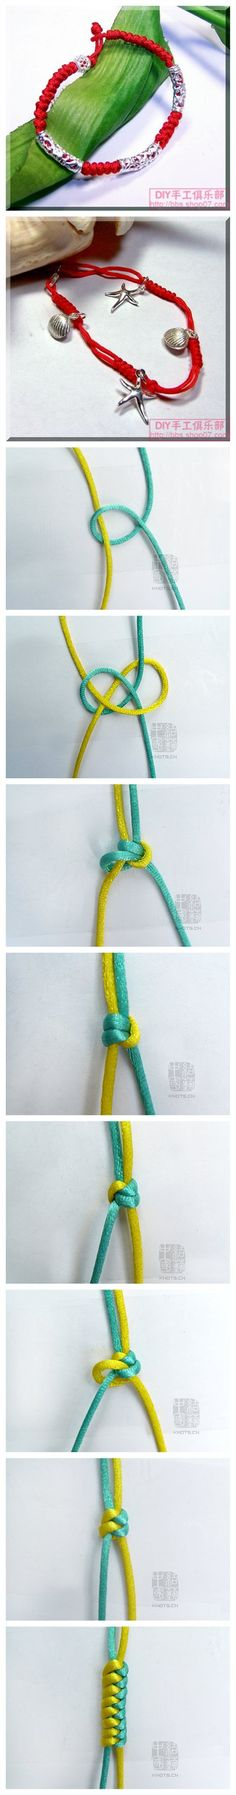 diy, diy projects, diy craft, handmade, diy weave bracelet - Folkvox - Presume lo que a ti te gusta -